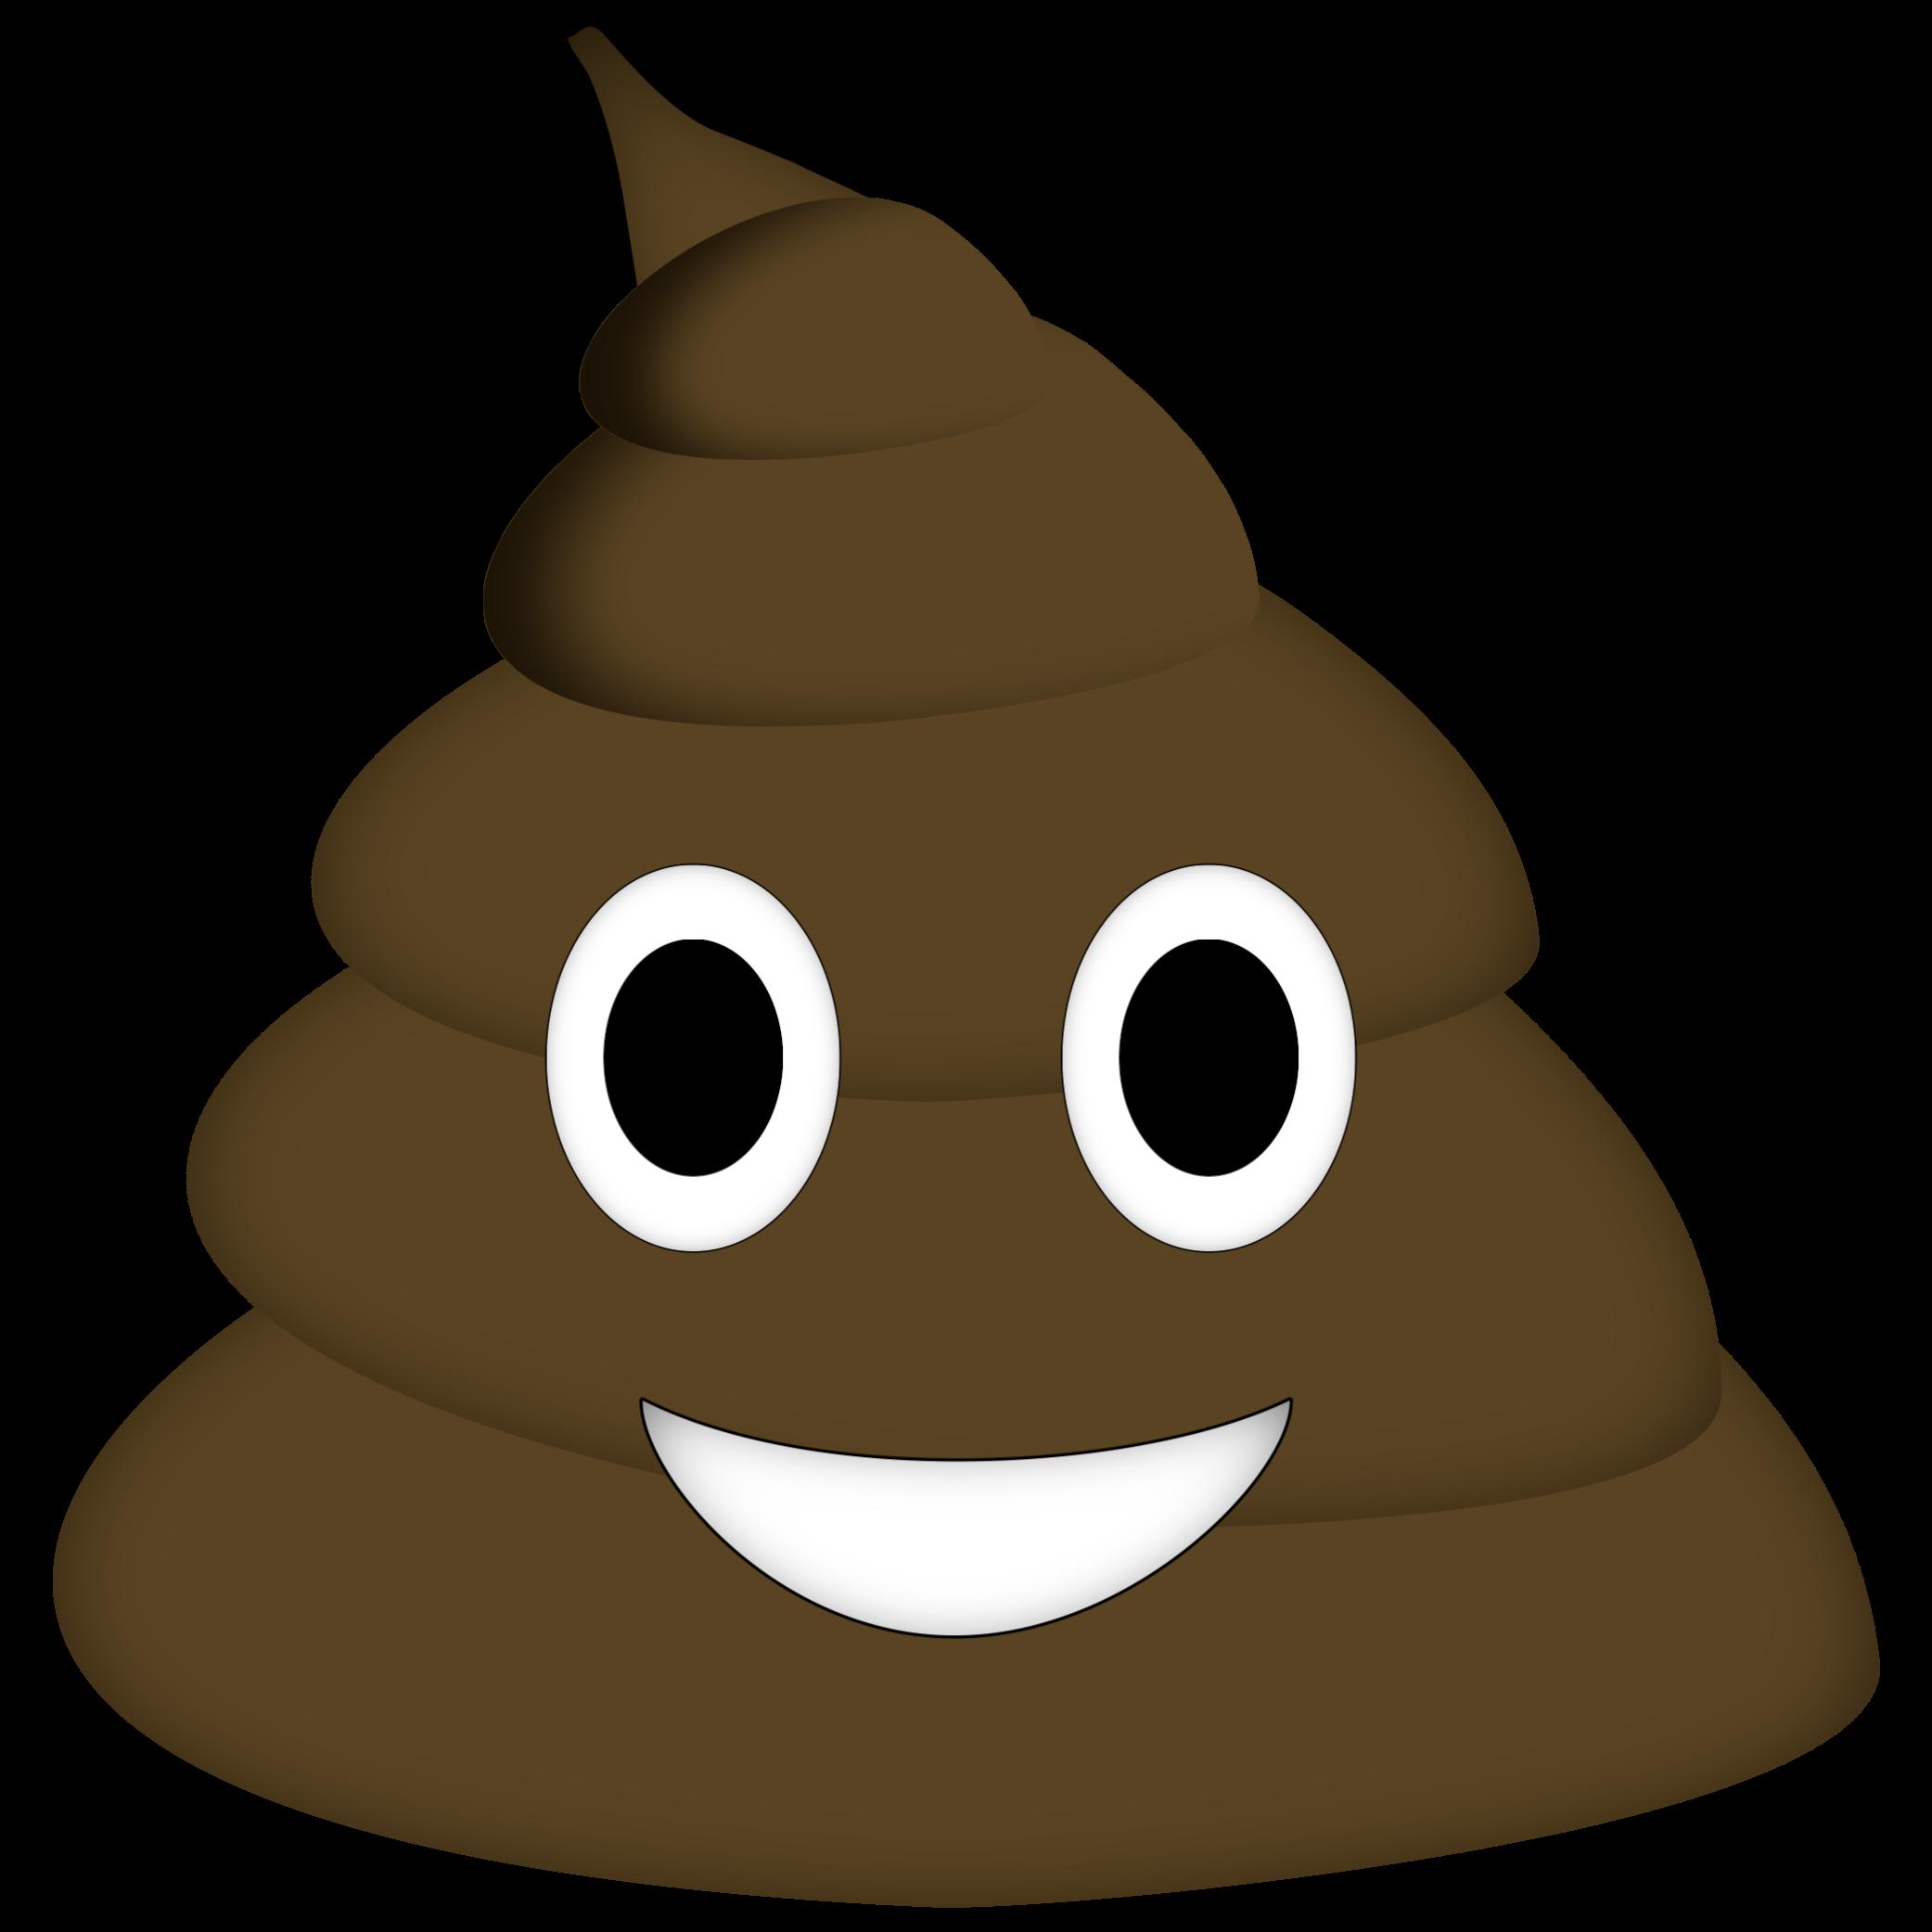 www papertraildesign com wp content uploads 2017 06 poop png rh pinterest com